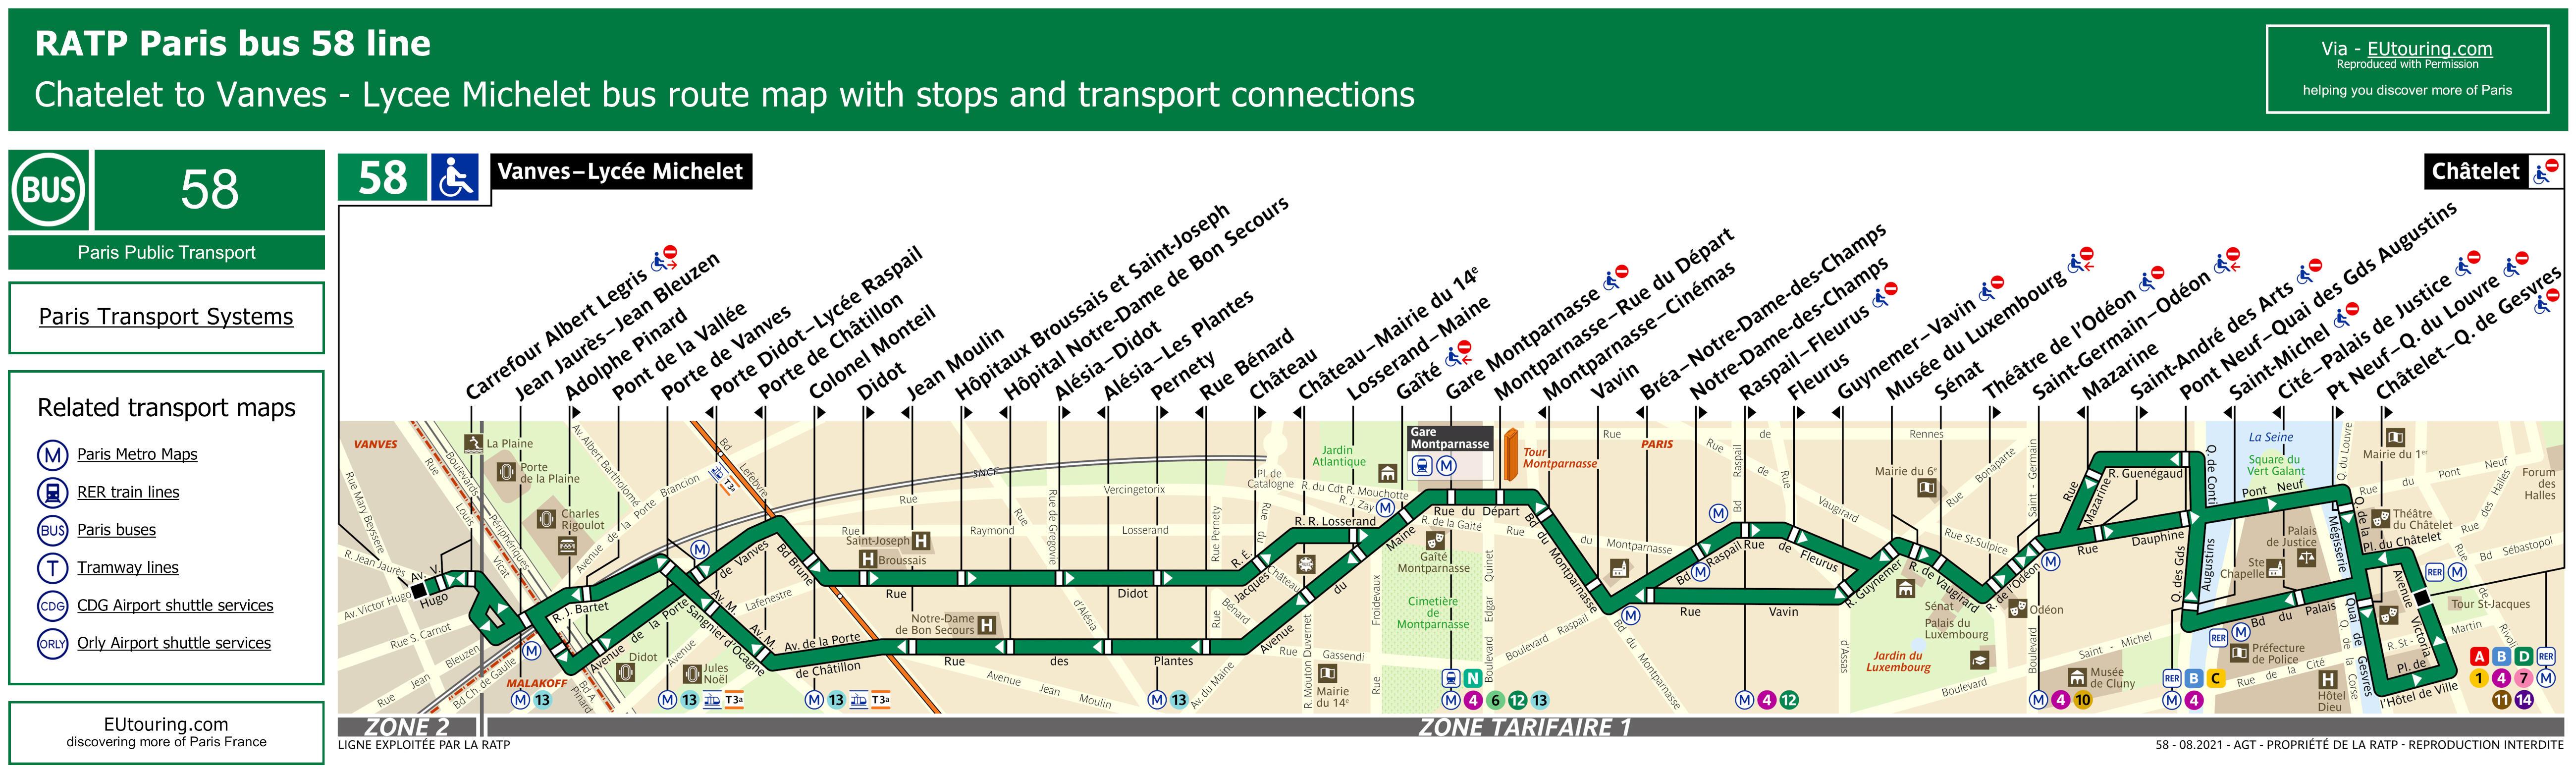 ratp route maps for paris bus lines 50 through to 59